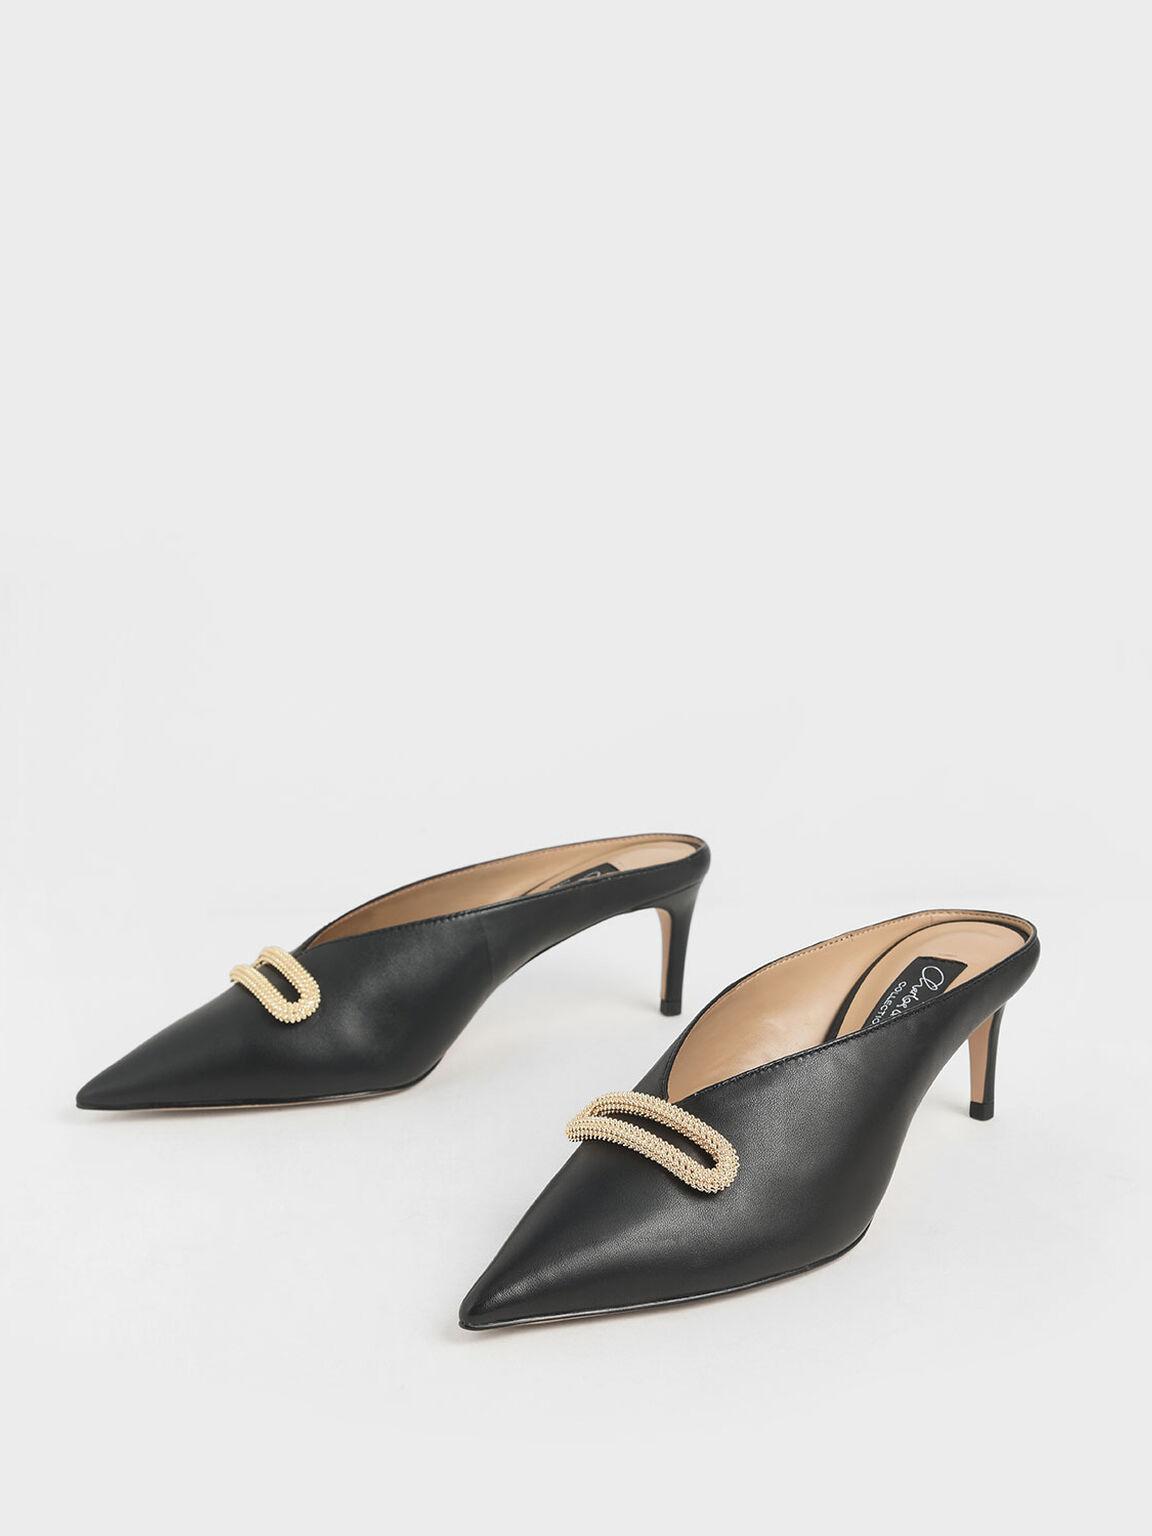 Leather Metallic Accent Heeled Mules, Black, hi-res